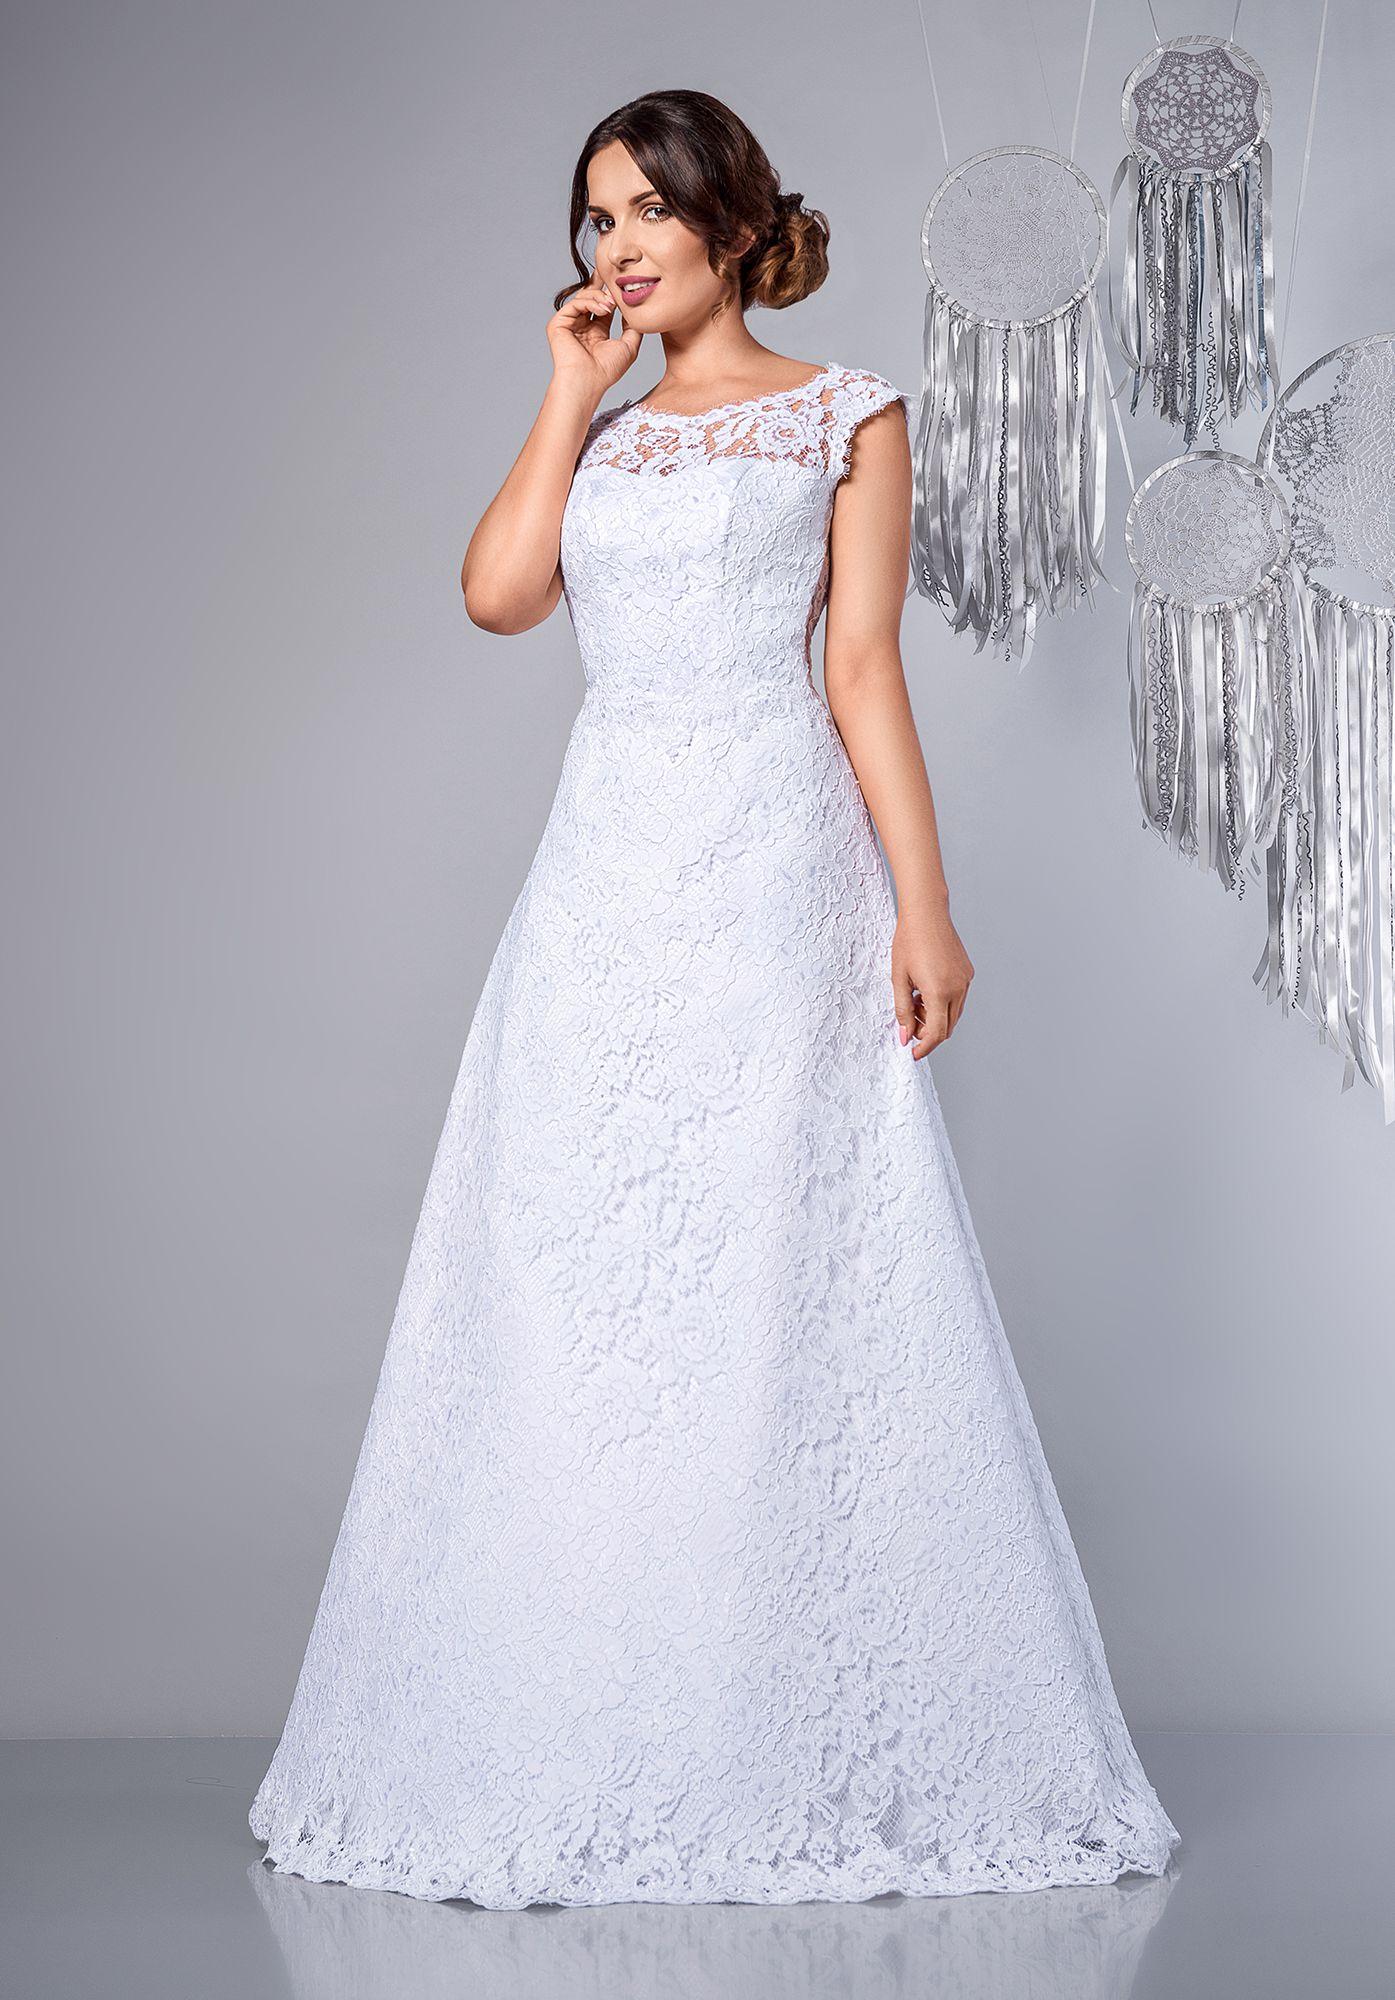 White Suknia Slubna Koronkowa Litera A A Line Full Lace Wedding Dress Sukniaslubna Weddingdress Weddinggow Wedding Dresses Wedding Dresses Lace Dresses